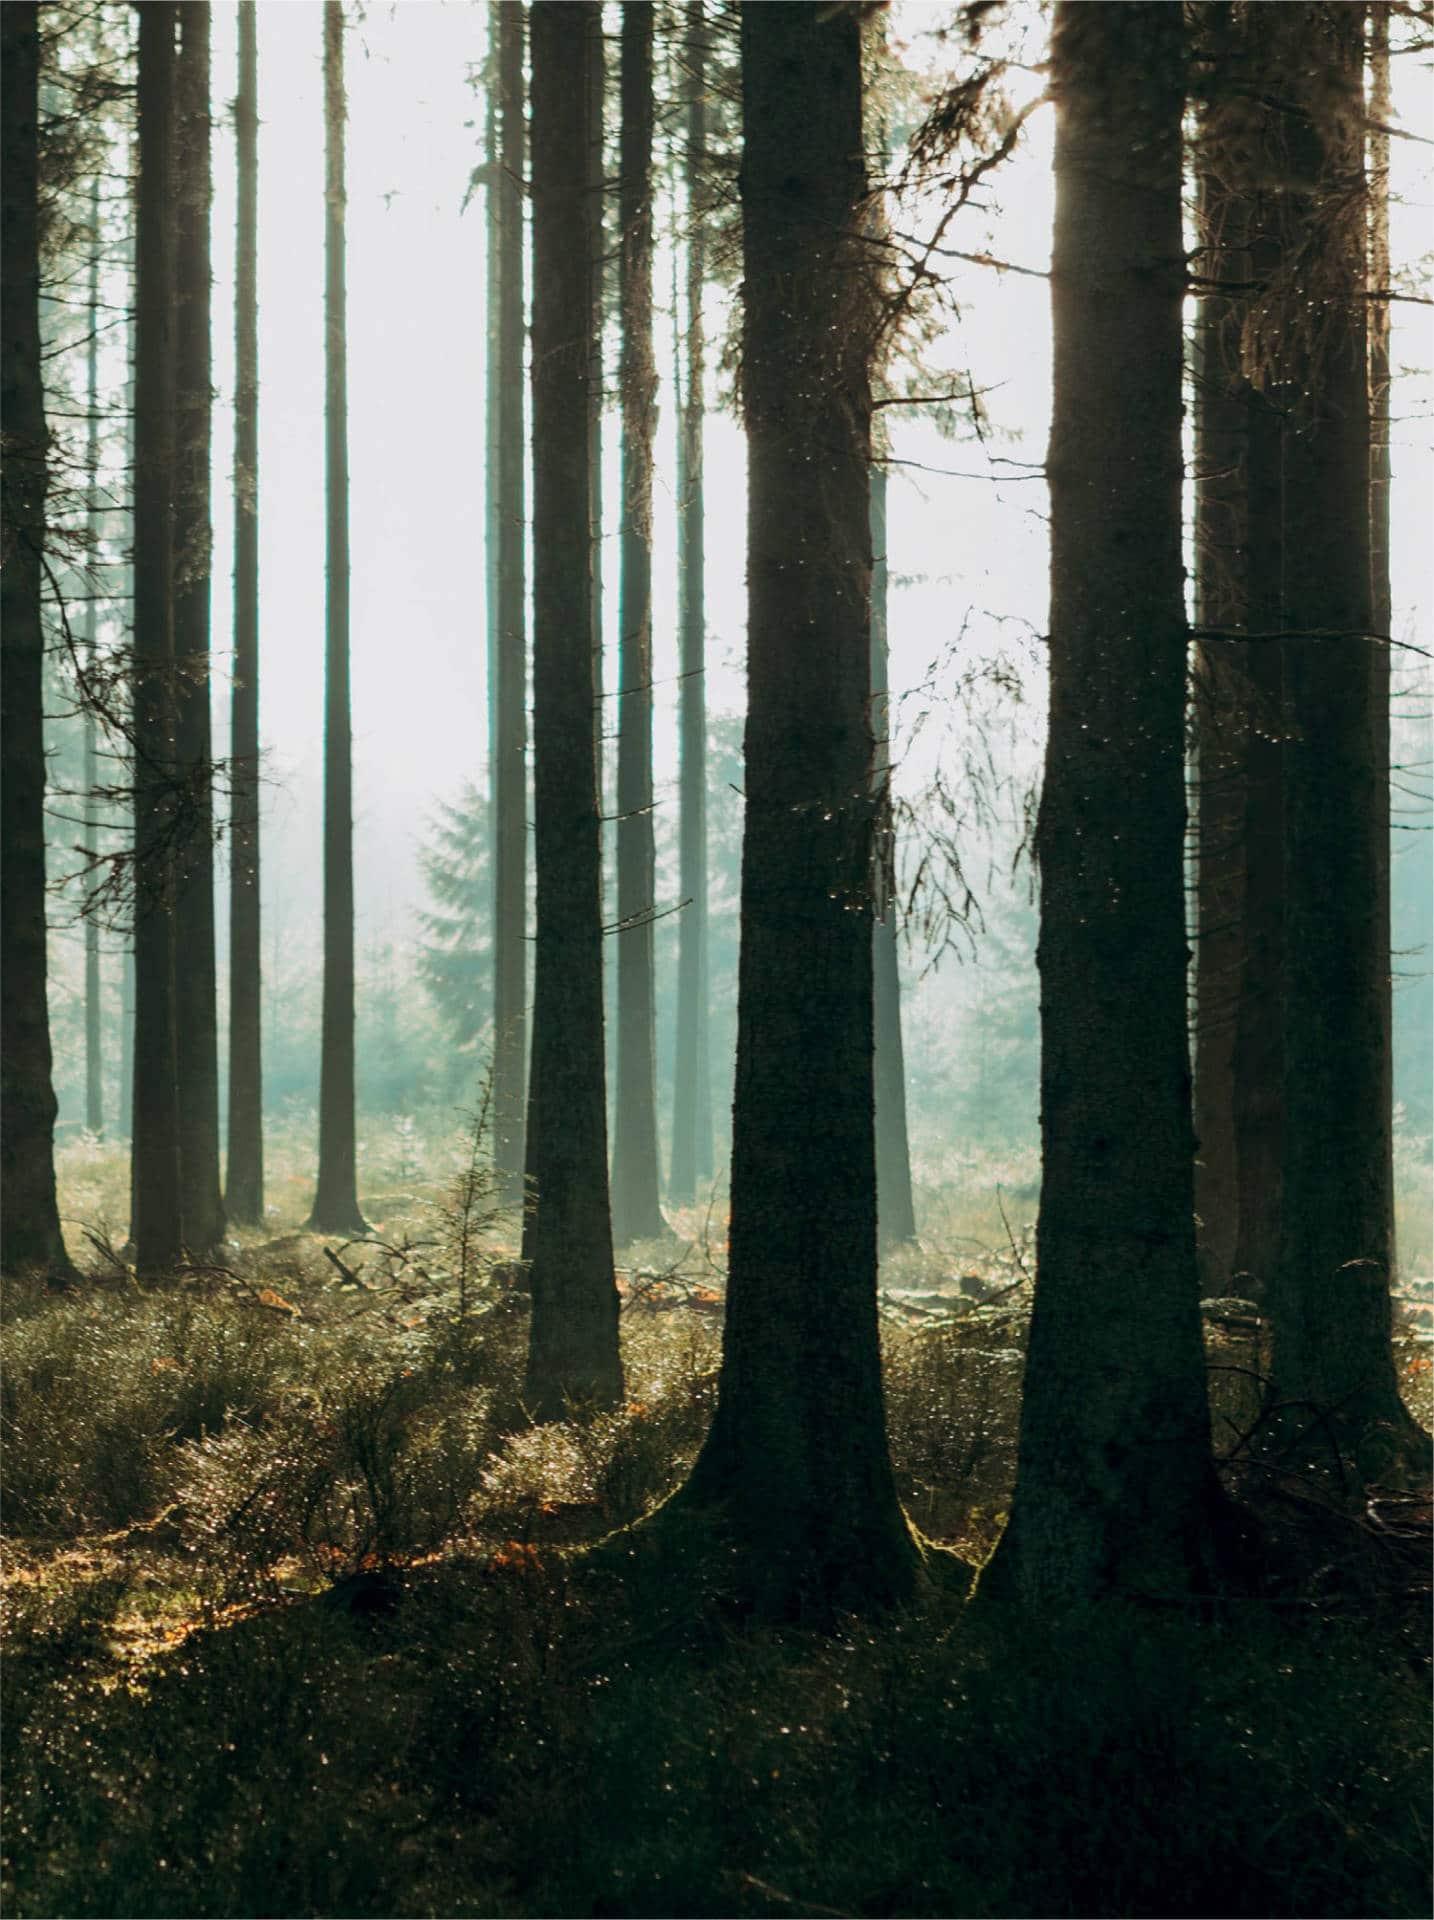 terra-nostra-urban-forest-miyawaki